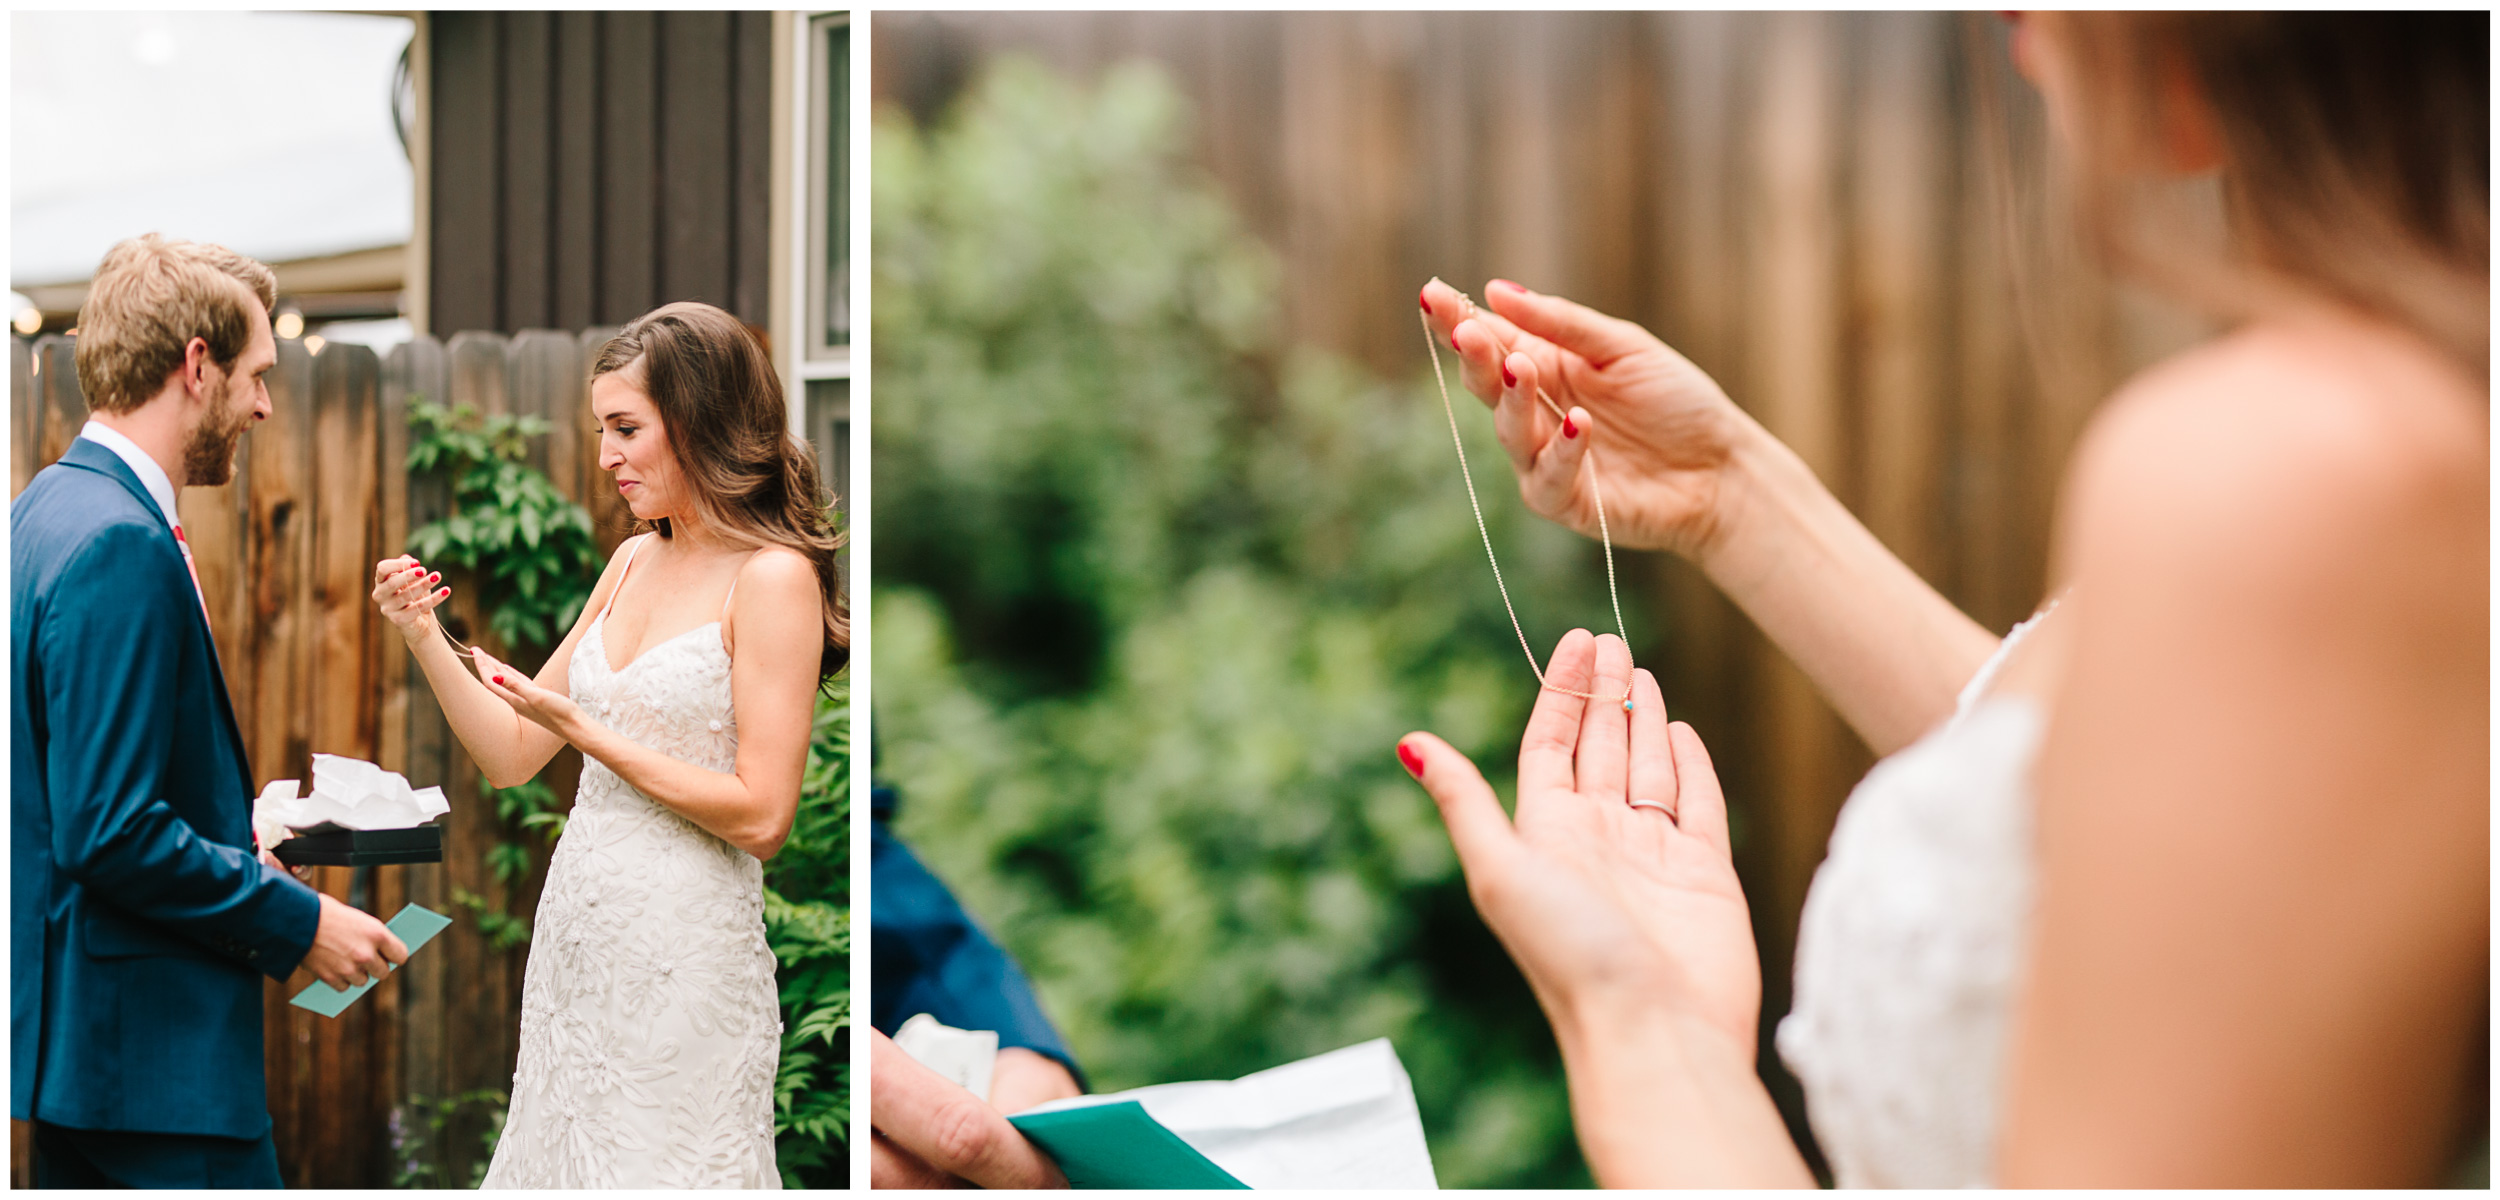 crested_butte_wedding_41.jpg